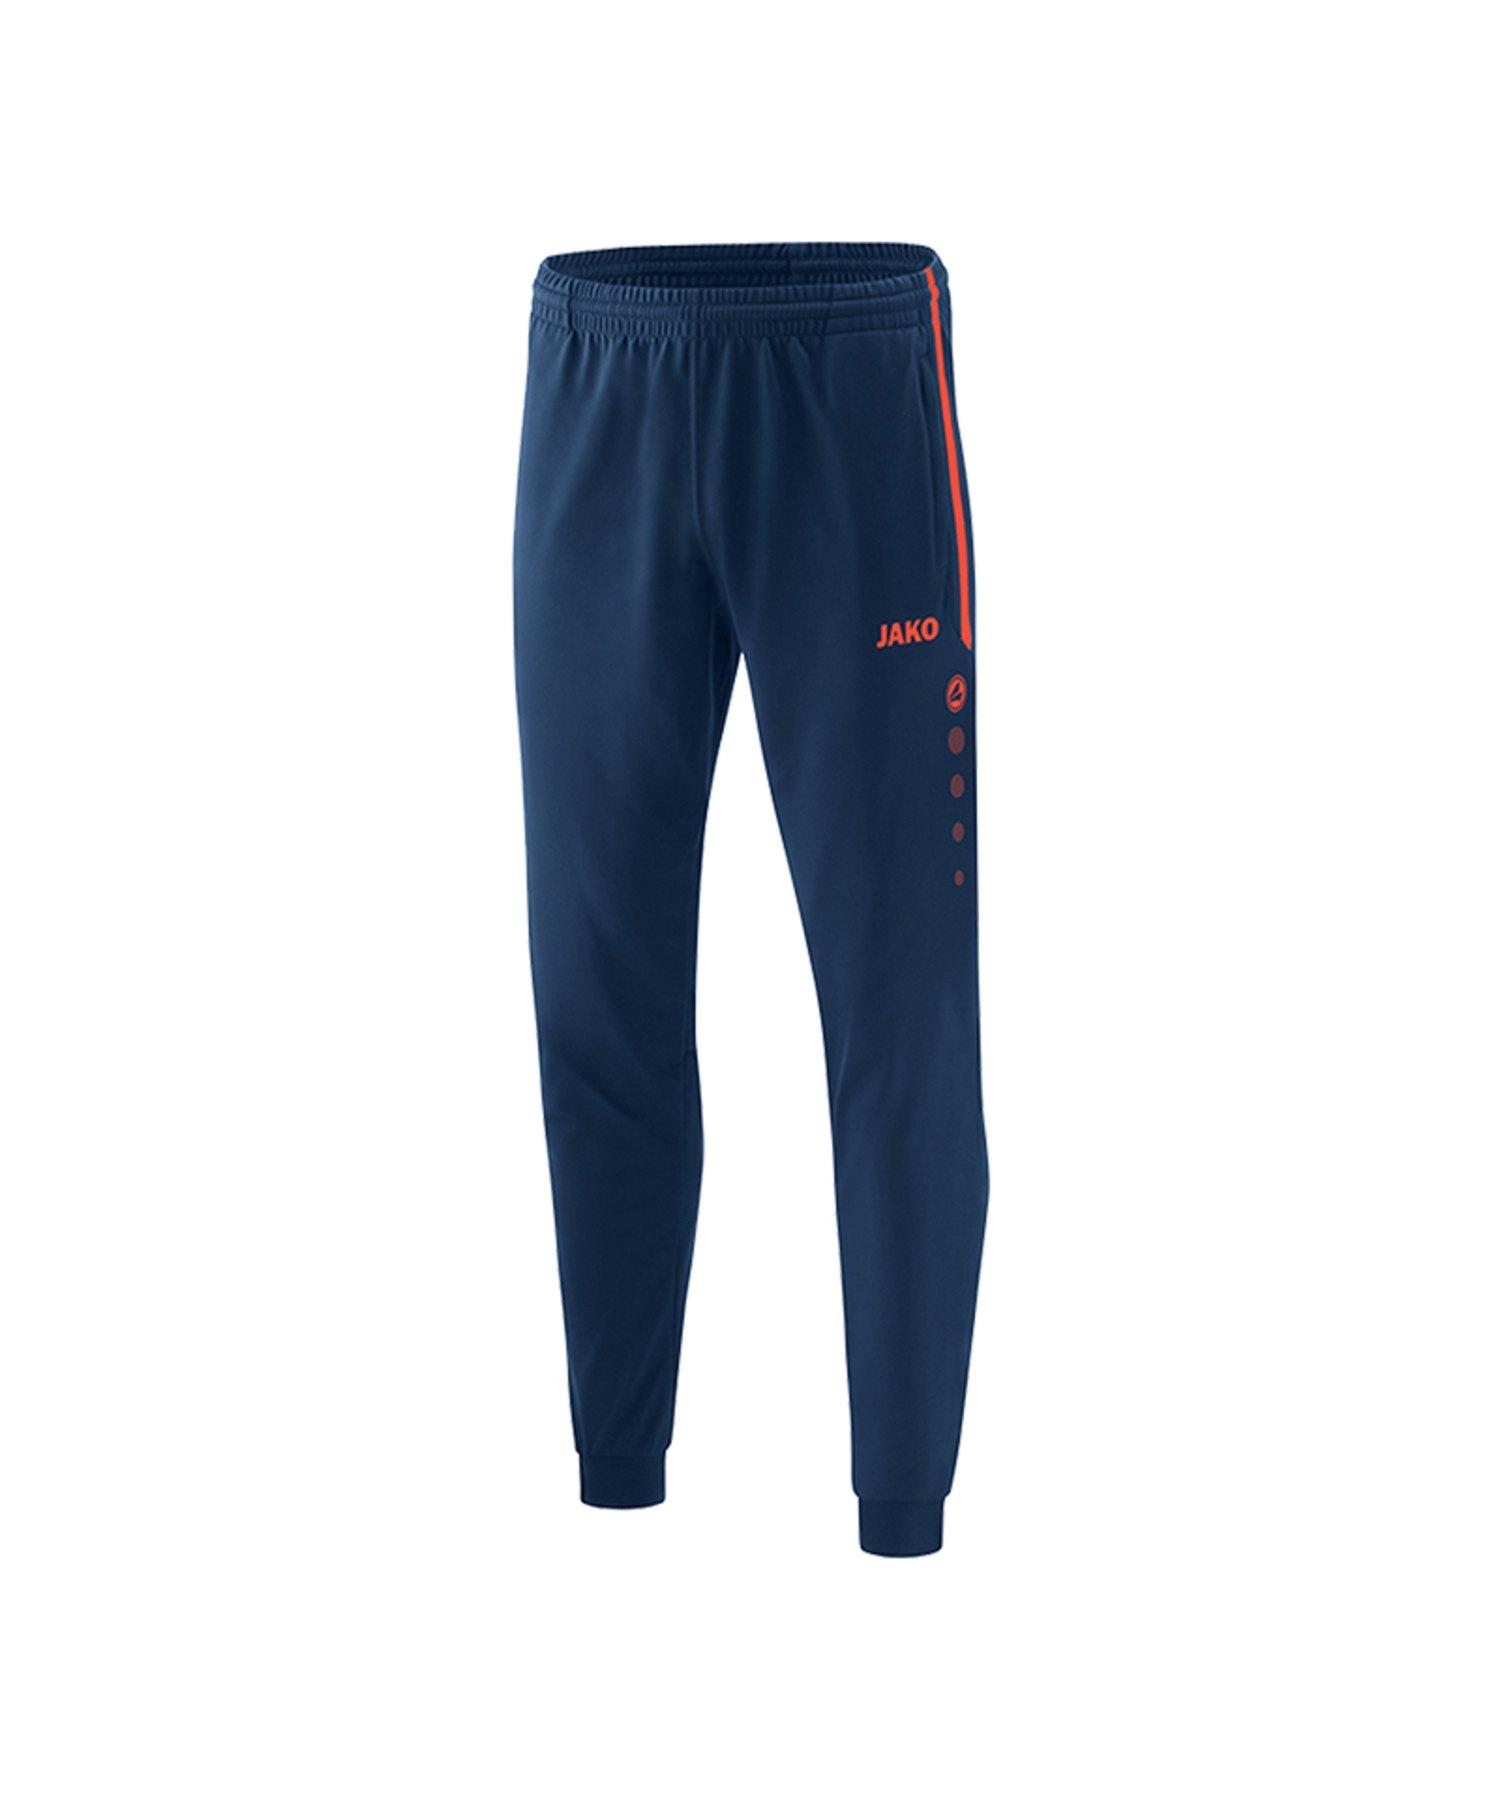 Jako Competition 2.0 Polyesterhose Blau Orange F18 - Blau